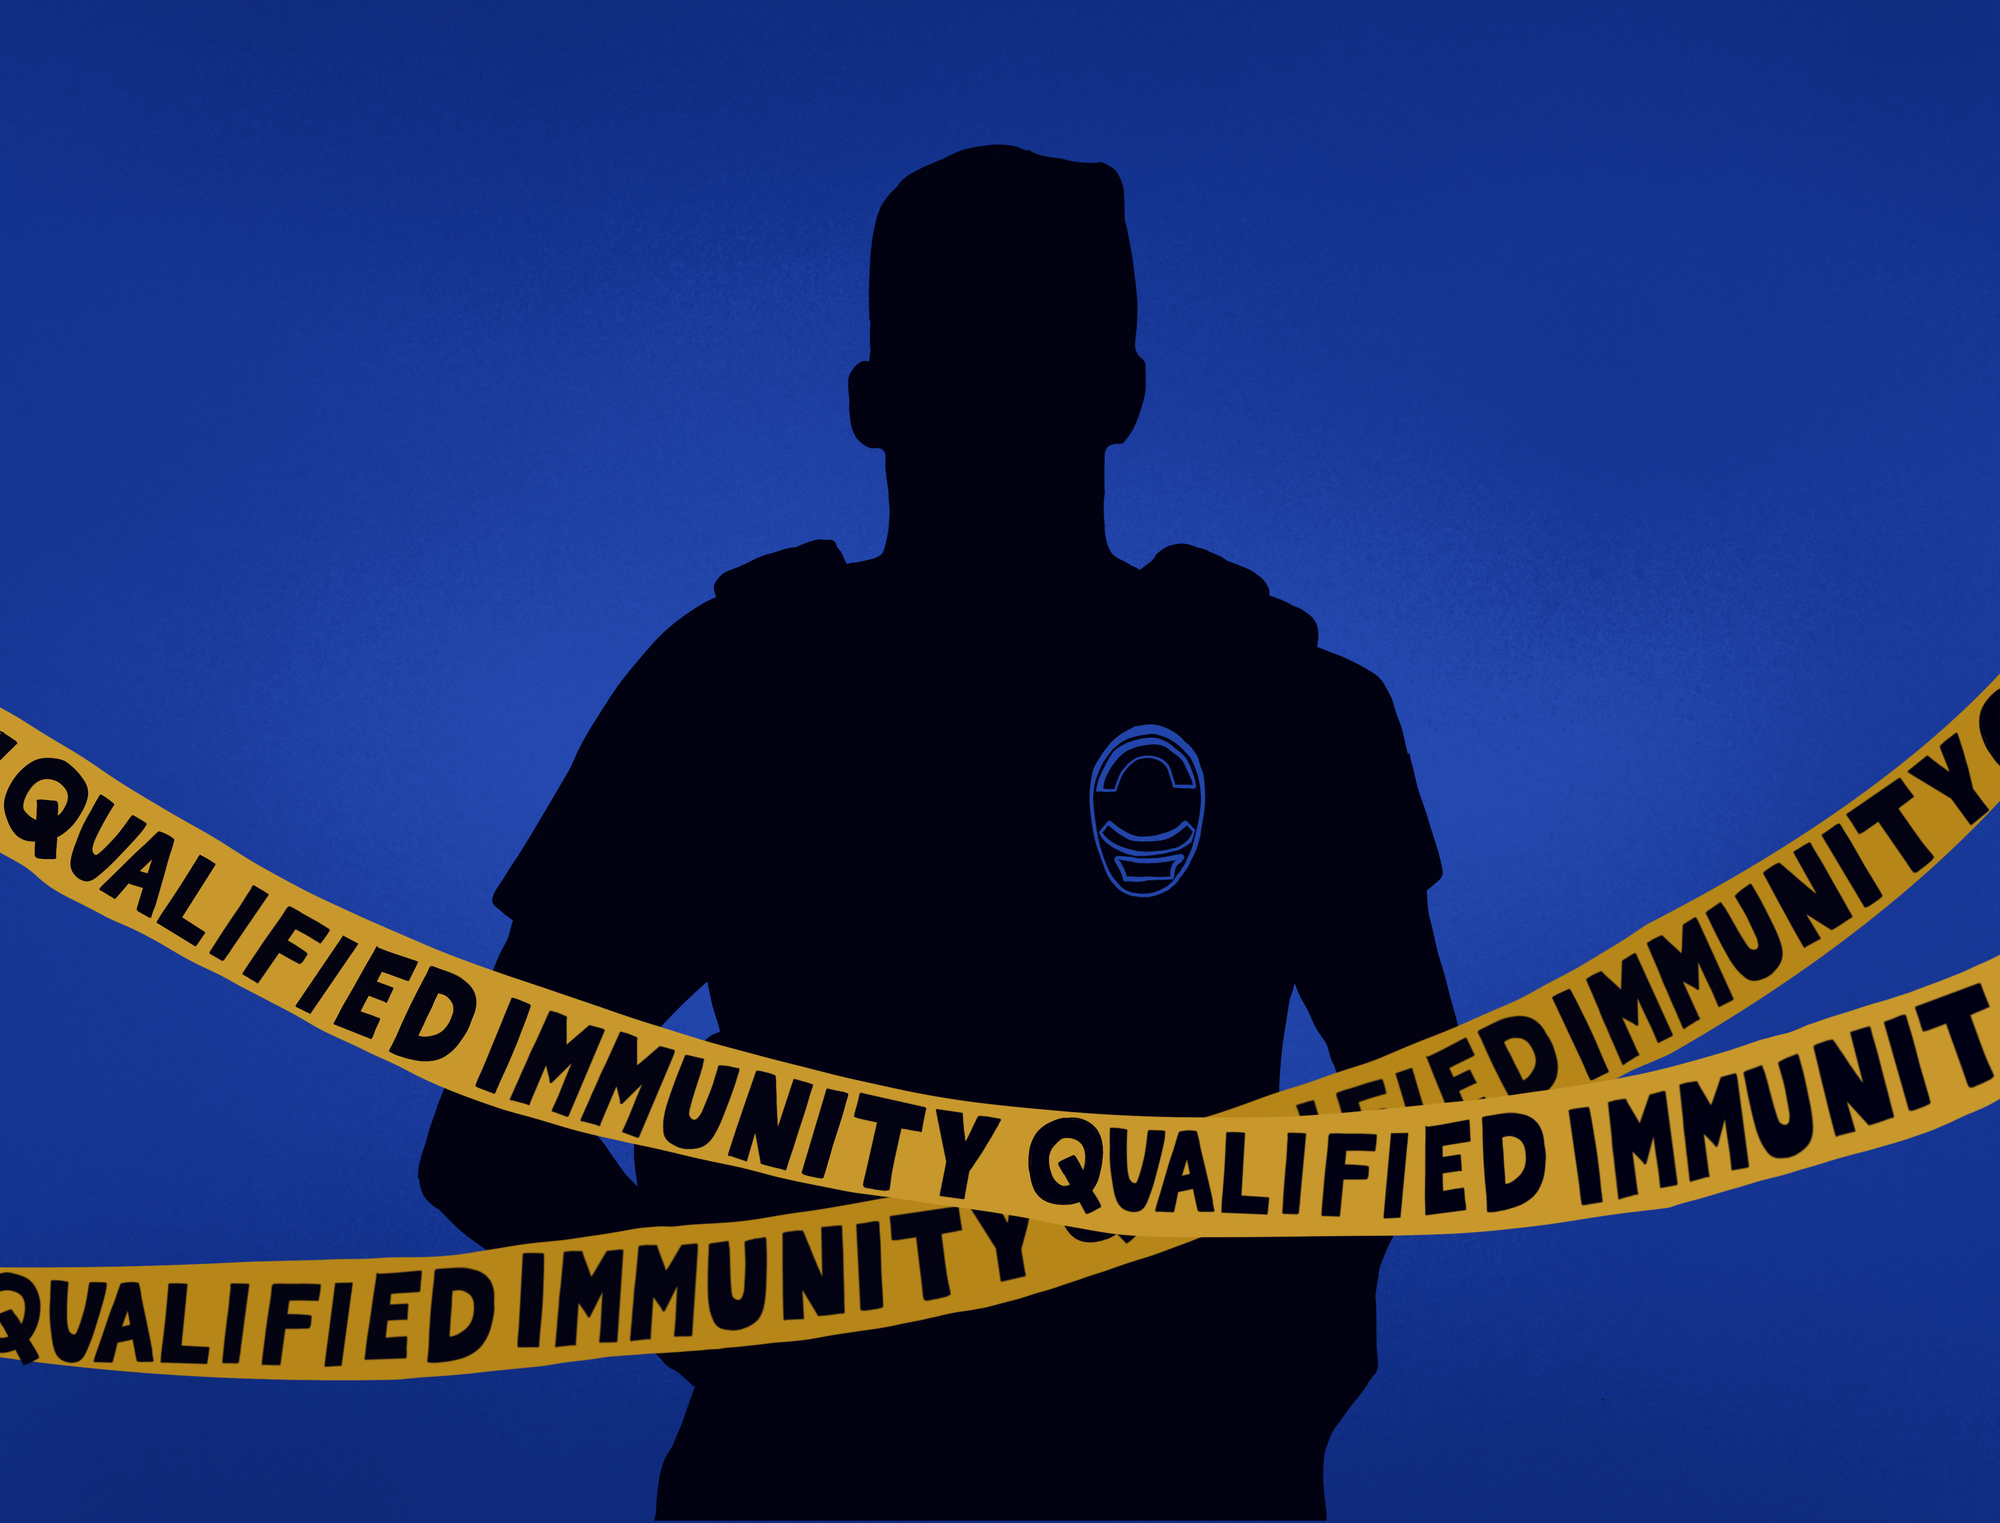 quad-qualified-immunity-POLICE